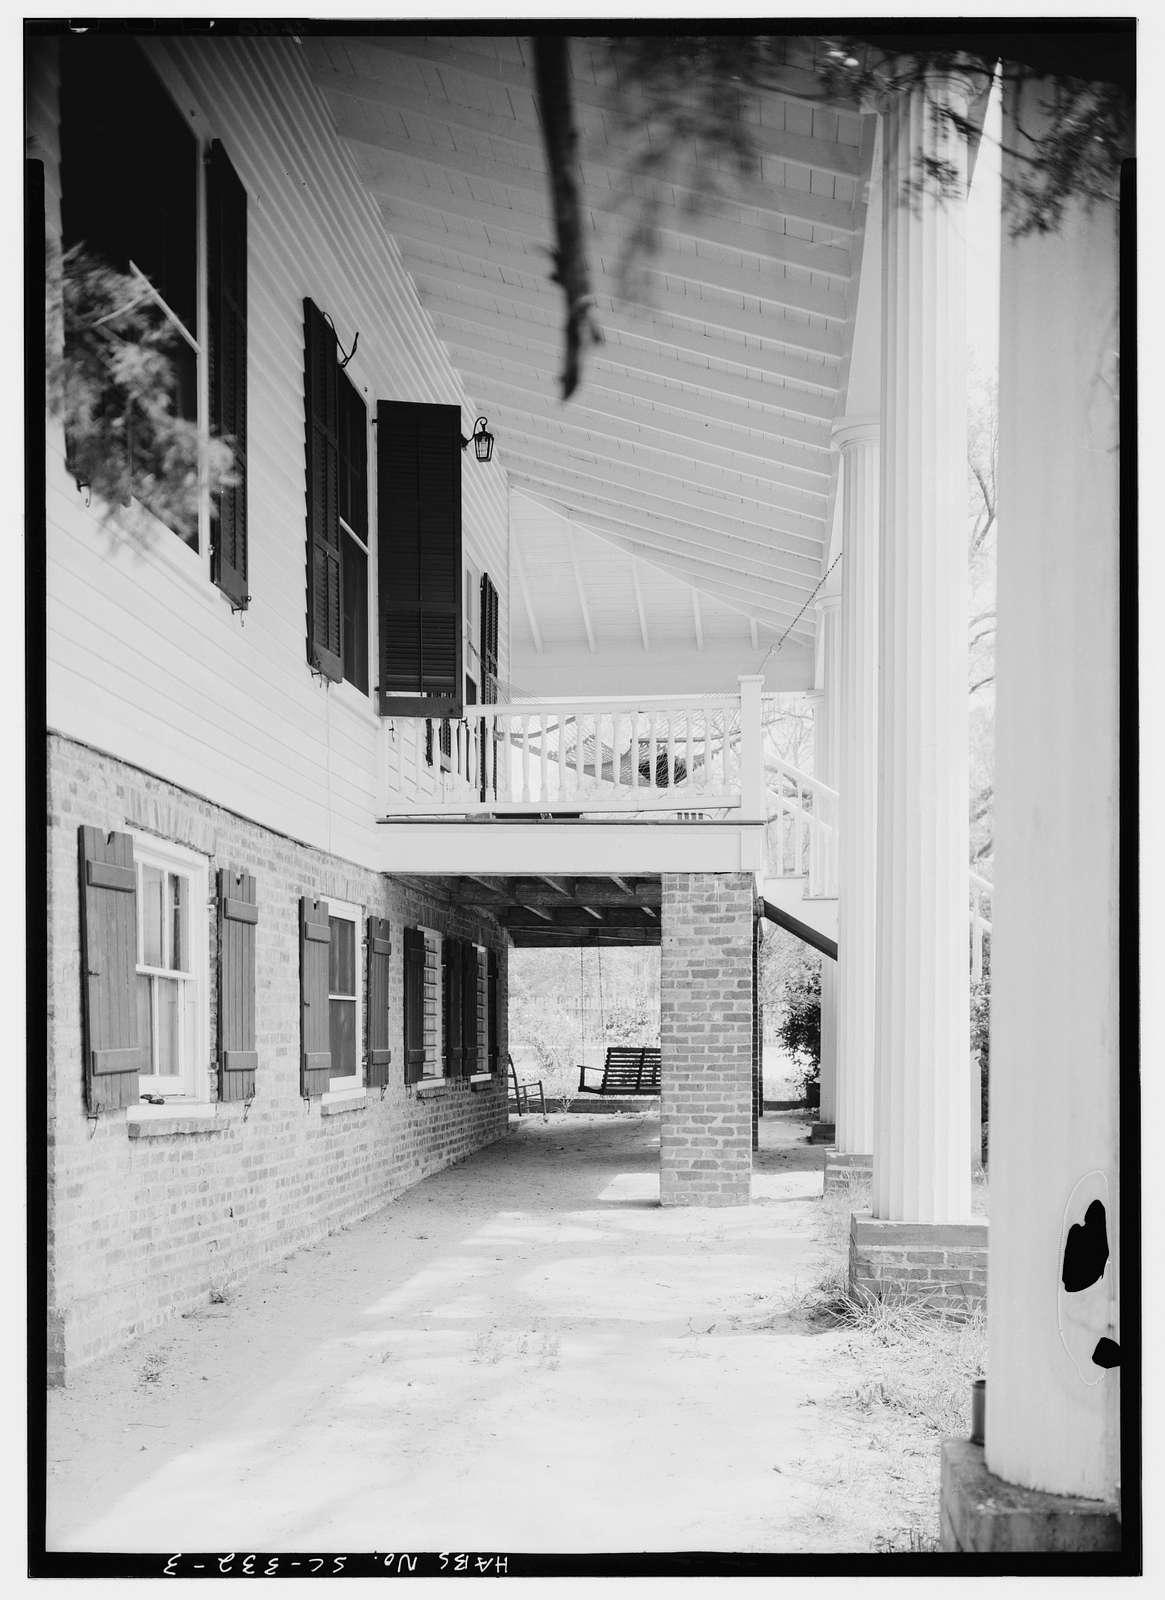 Bloomsbury, 1707 Lyttleton Street, Camden, Kershaw County, SC